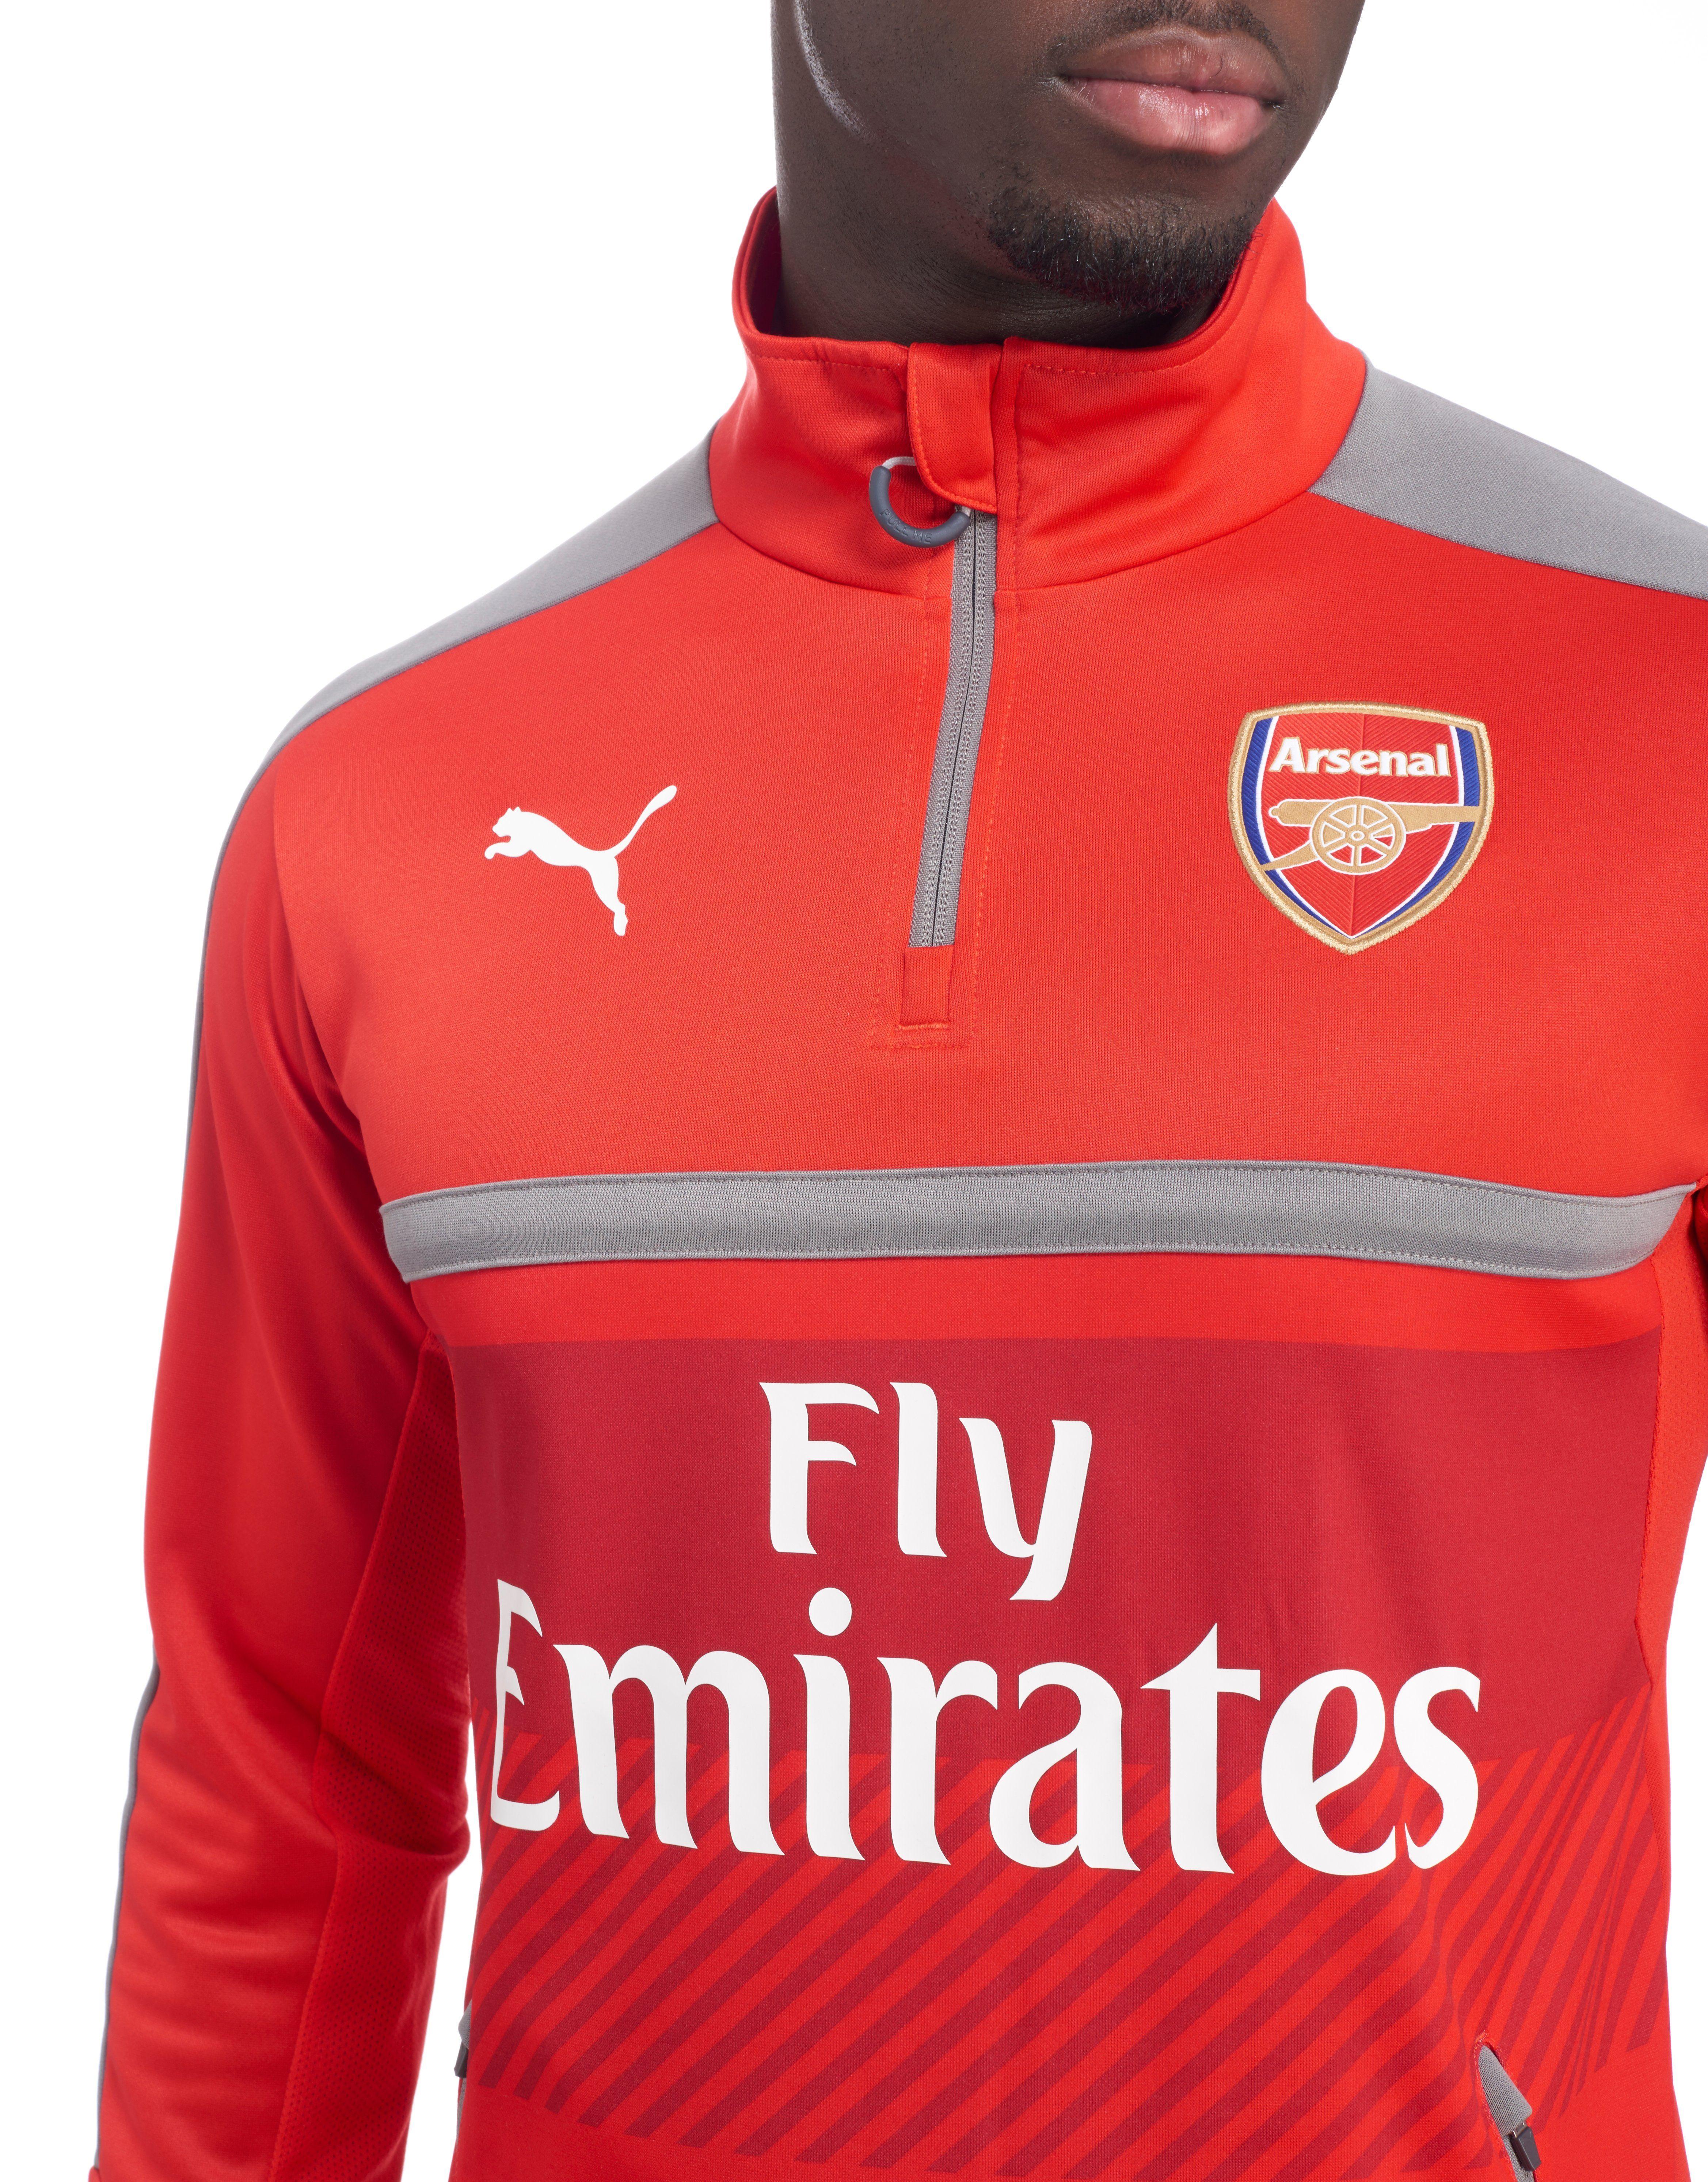 PUMA Arsenal FC 2016/17 Quarter Zip Training Top